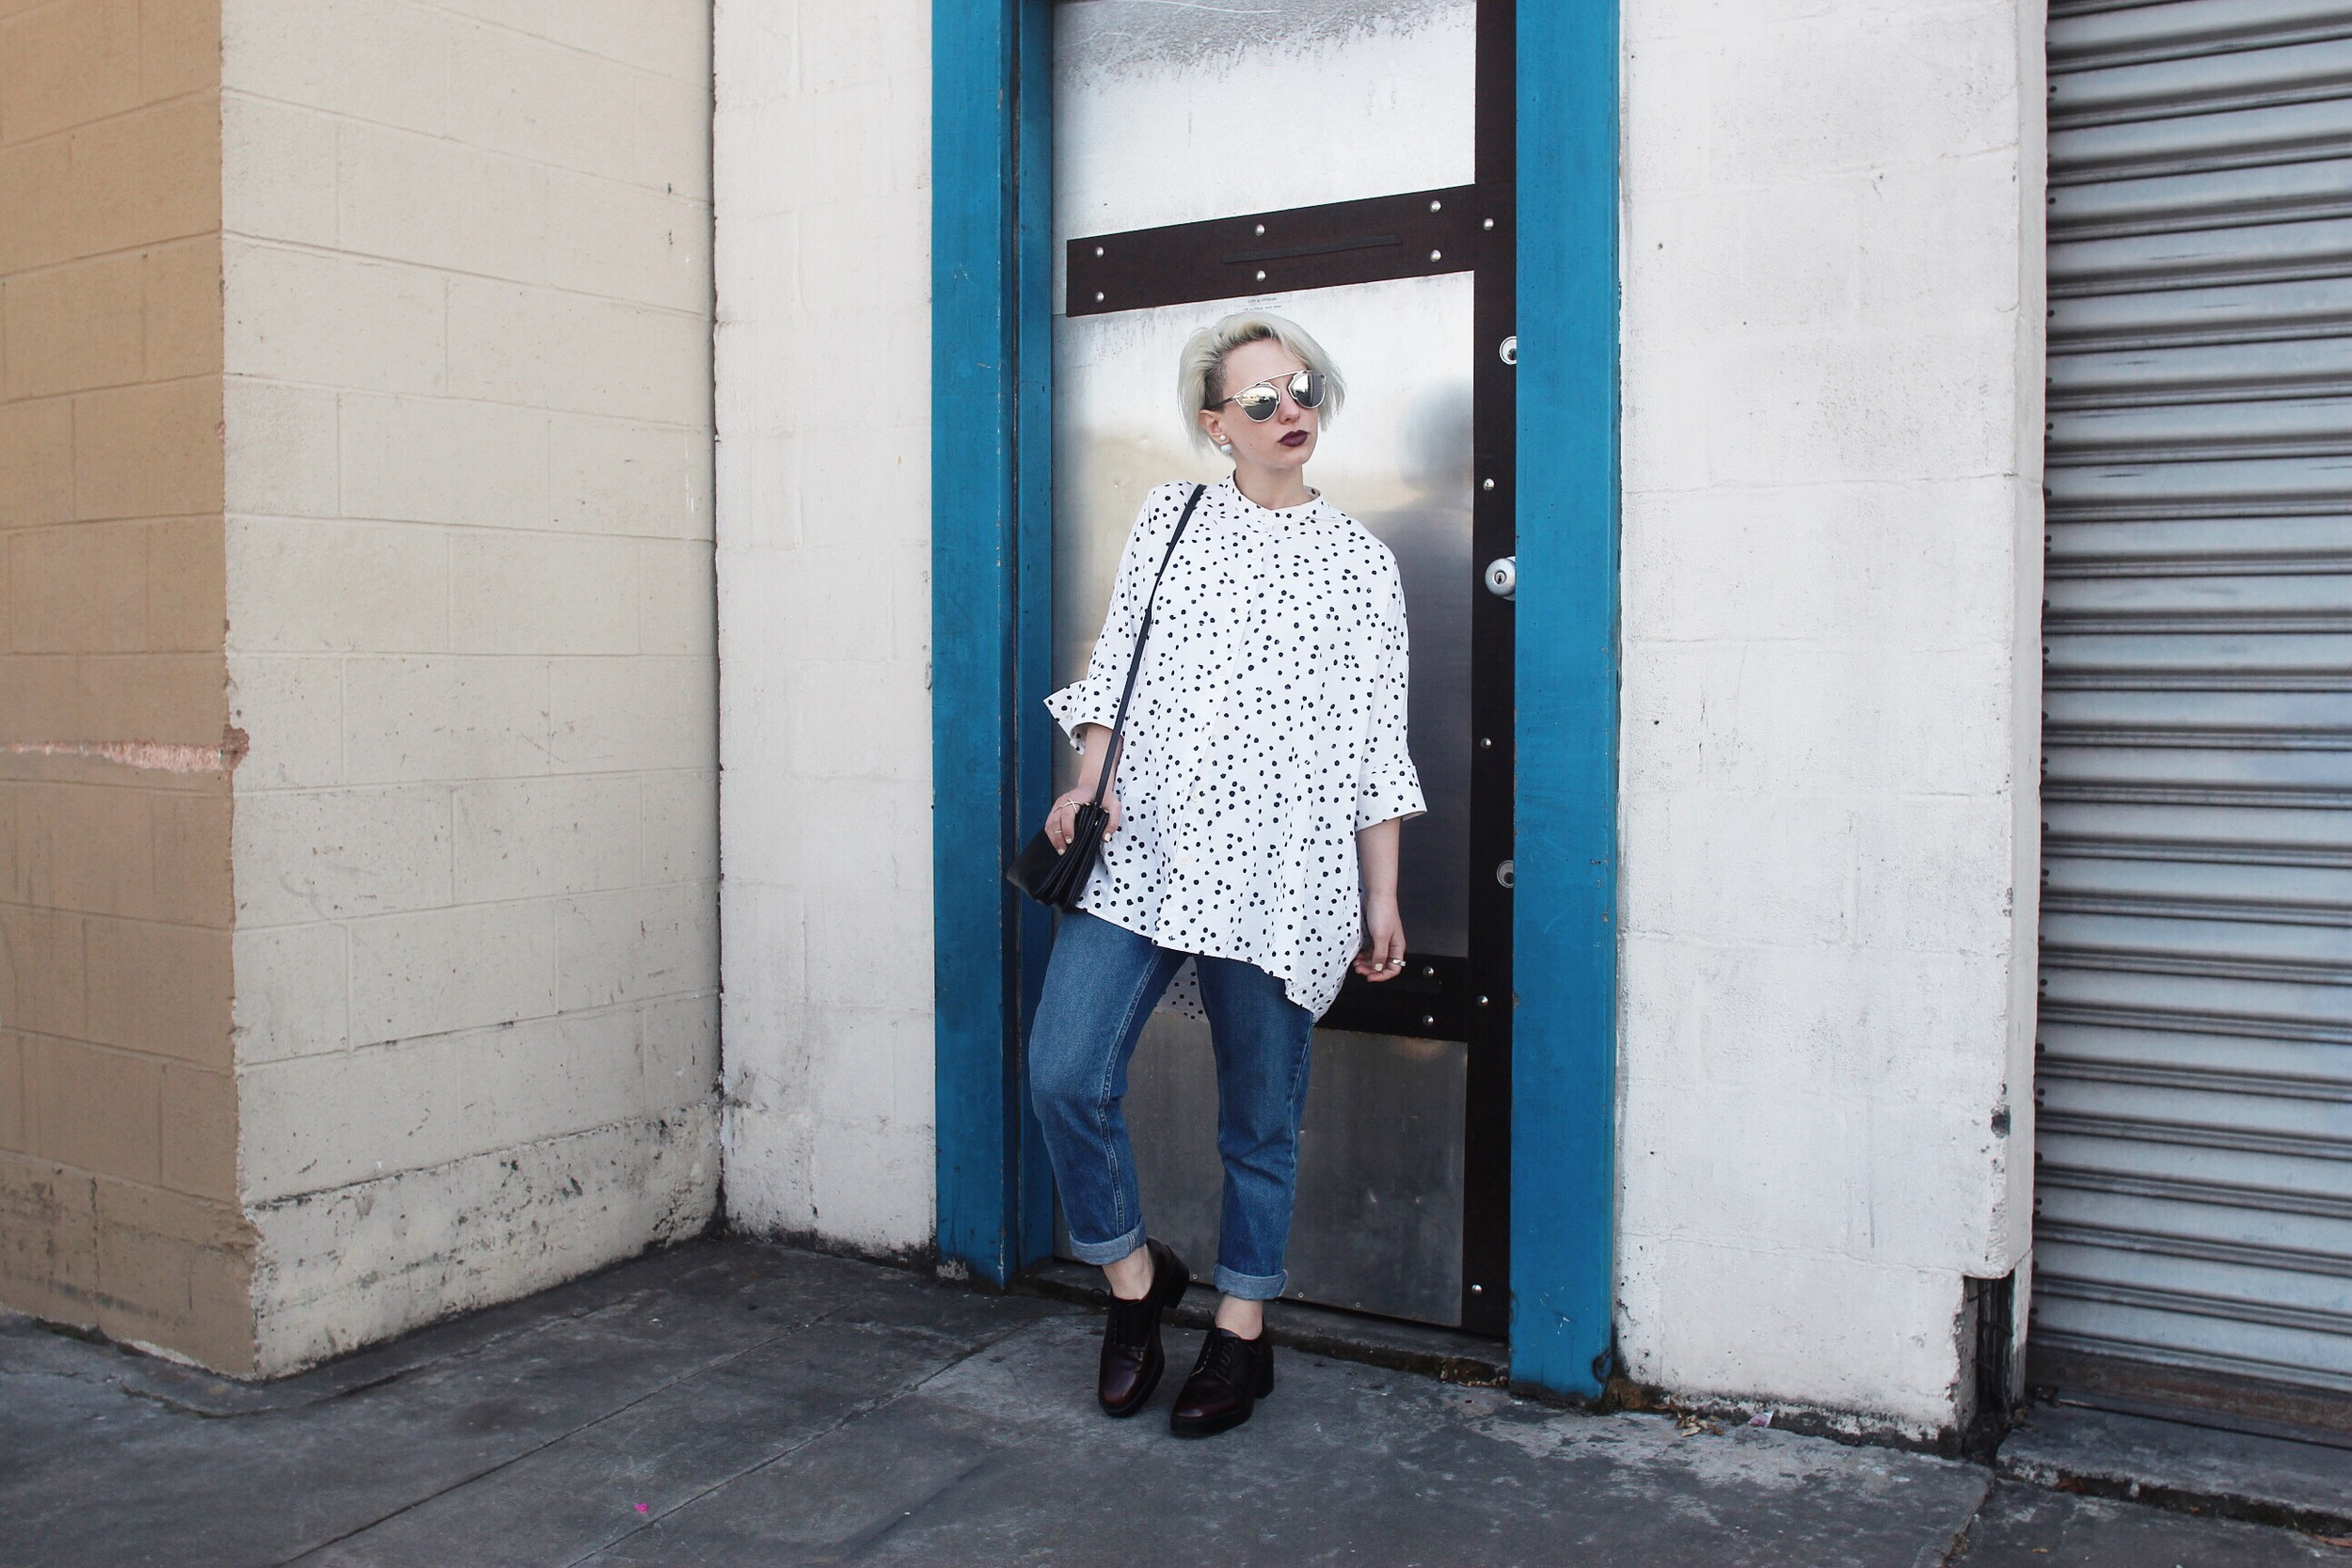 Tunic:  The Podolls , Jeans:  Topshop , Shoes: Zara, Bag: Celine, Sunglasses & Earrings:  Dior